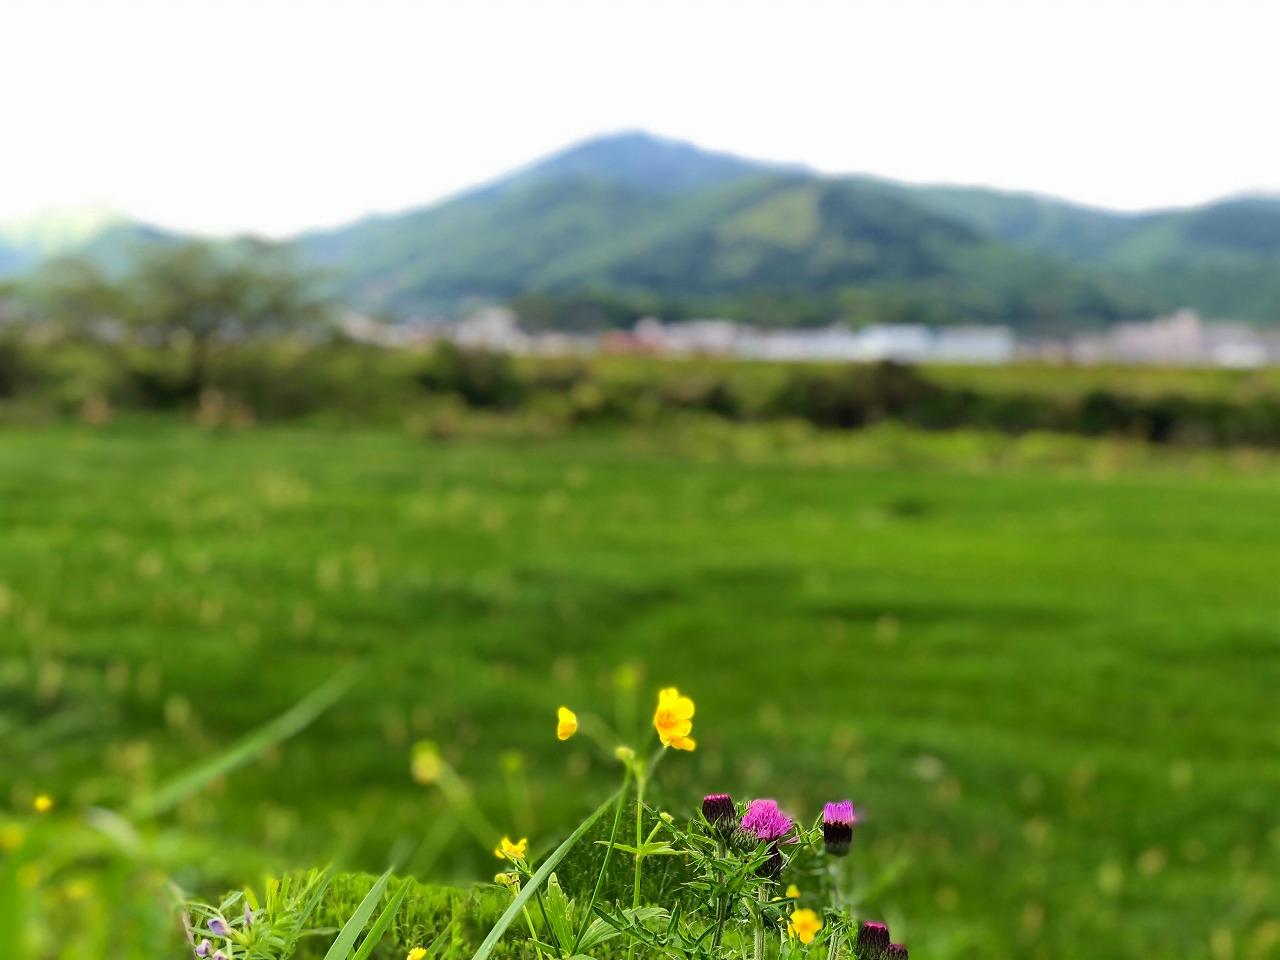 2018.4.25今朝の金峰山